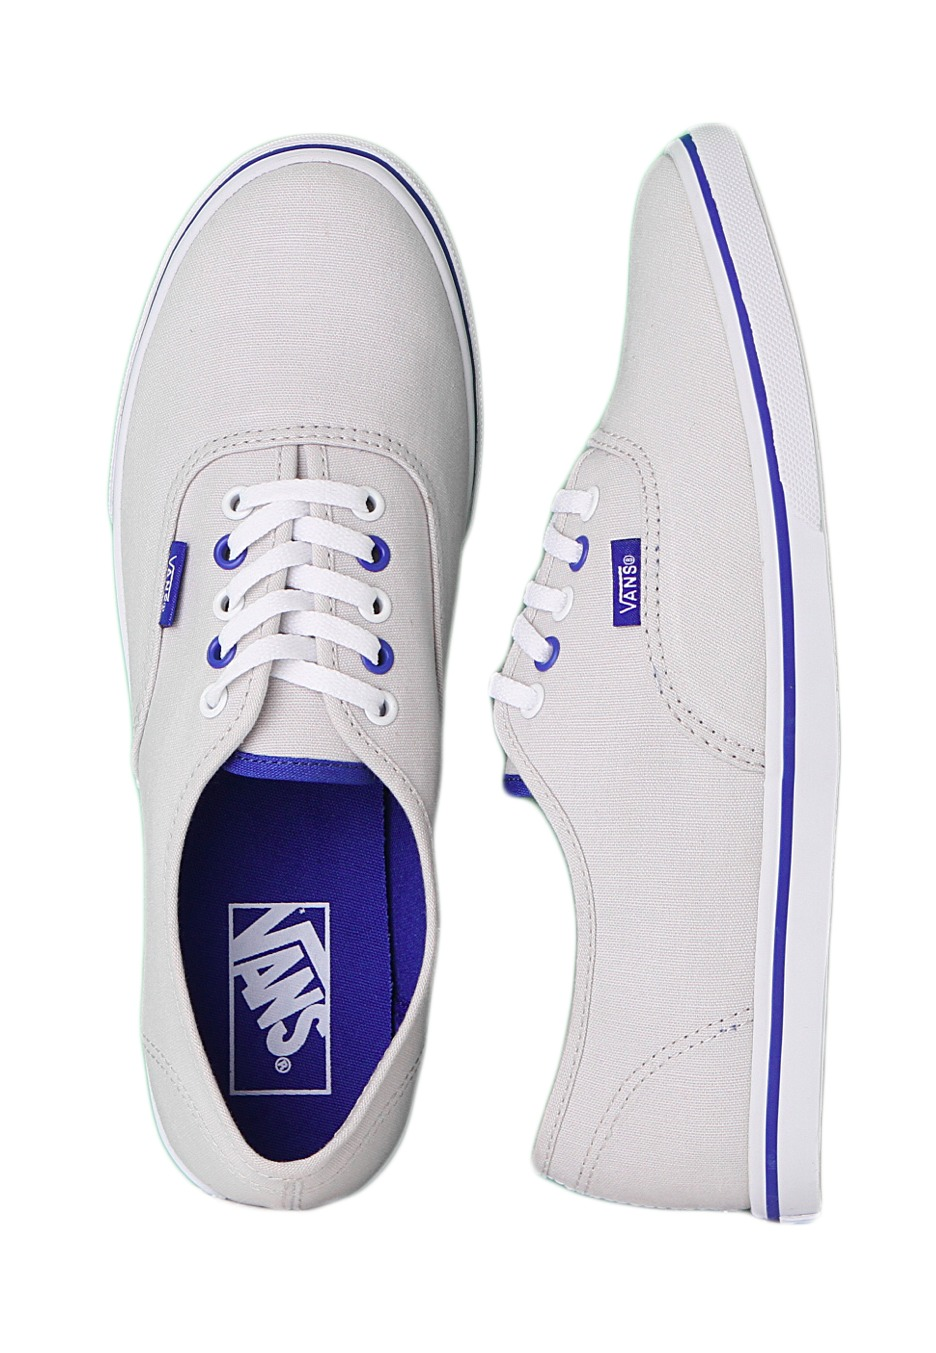 e63b469e09 Vans - Authentic Lo Pro Lunar Rock True White - Girl Shoes - Impericon.com  Worldwide